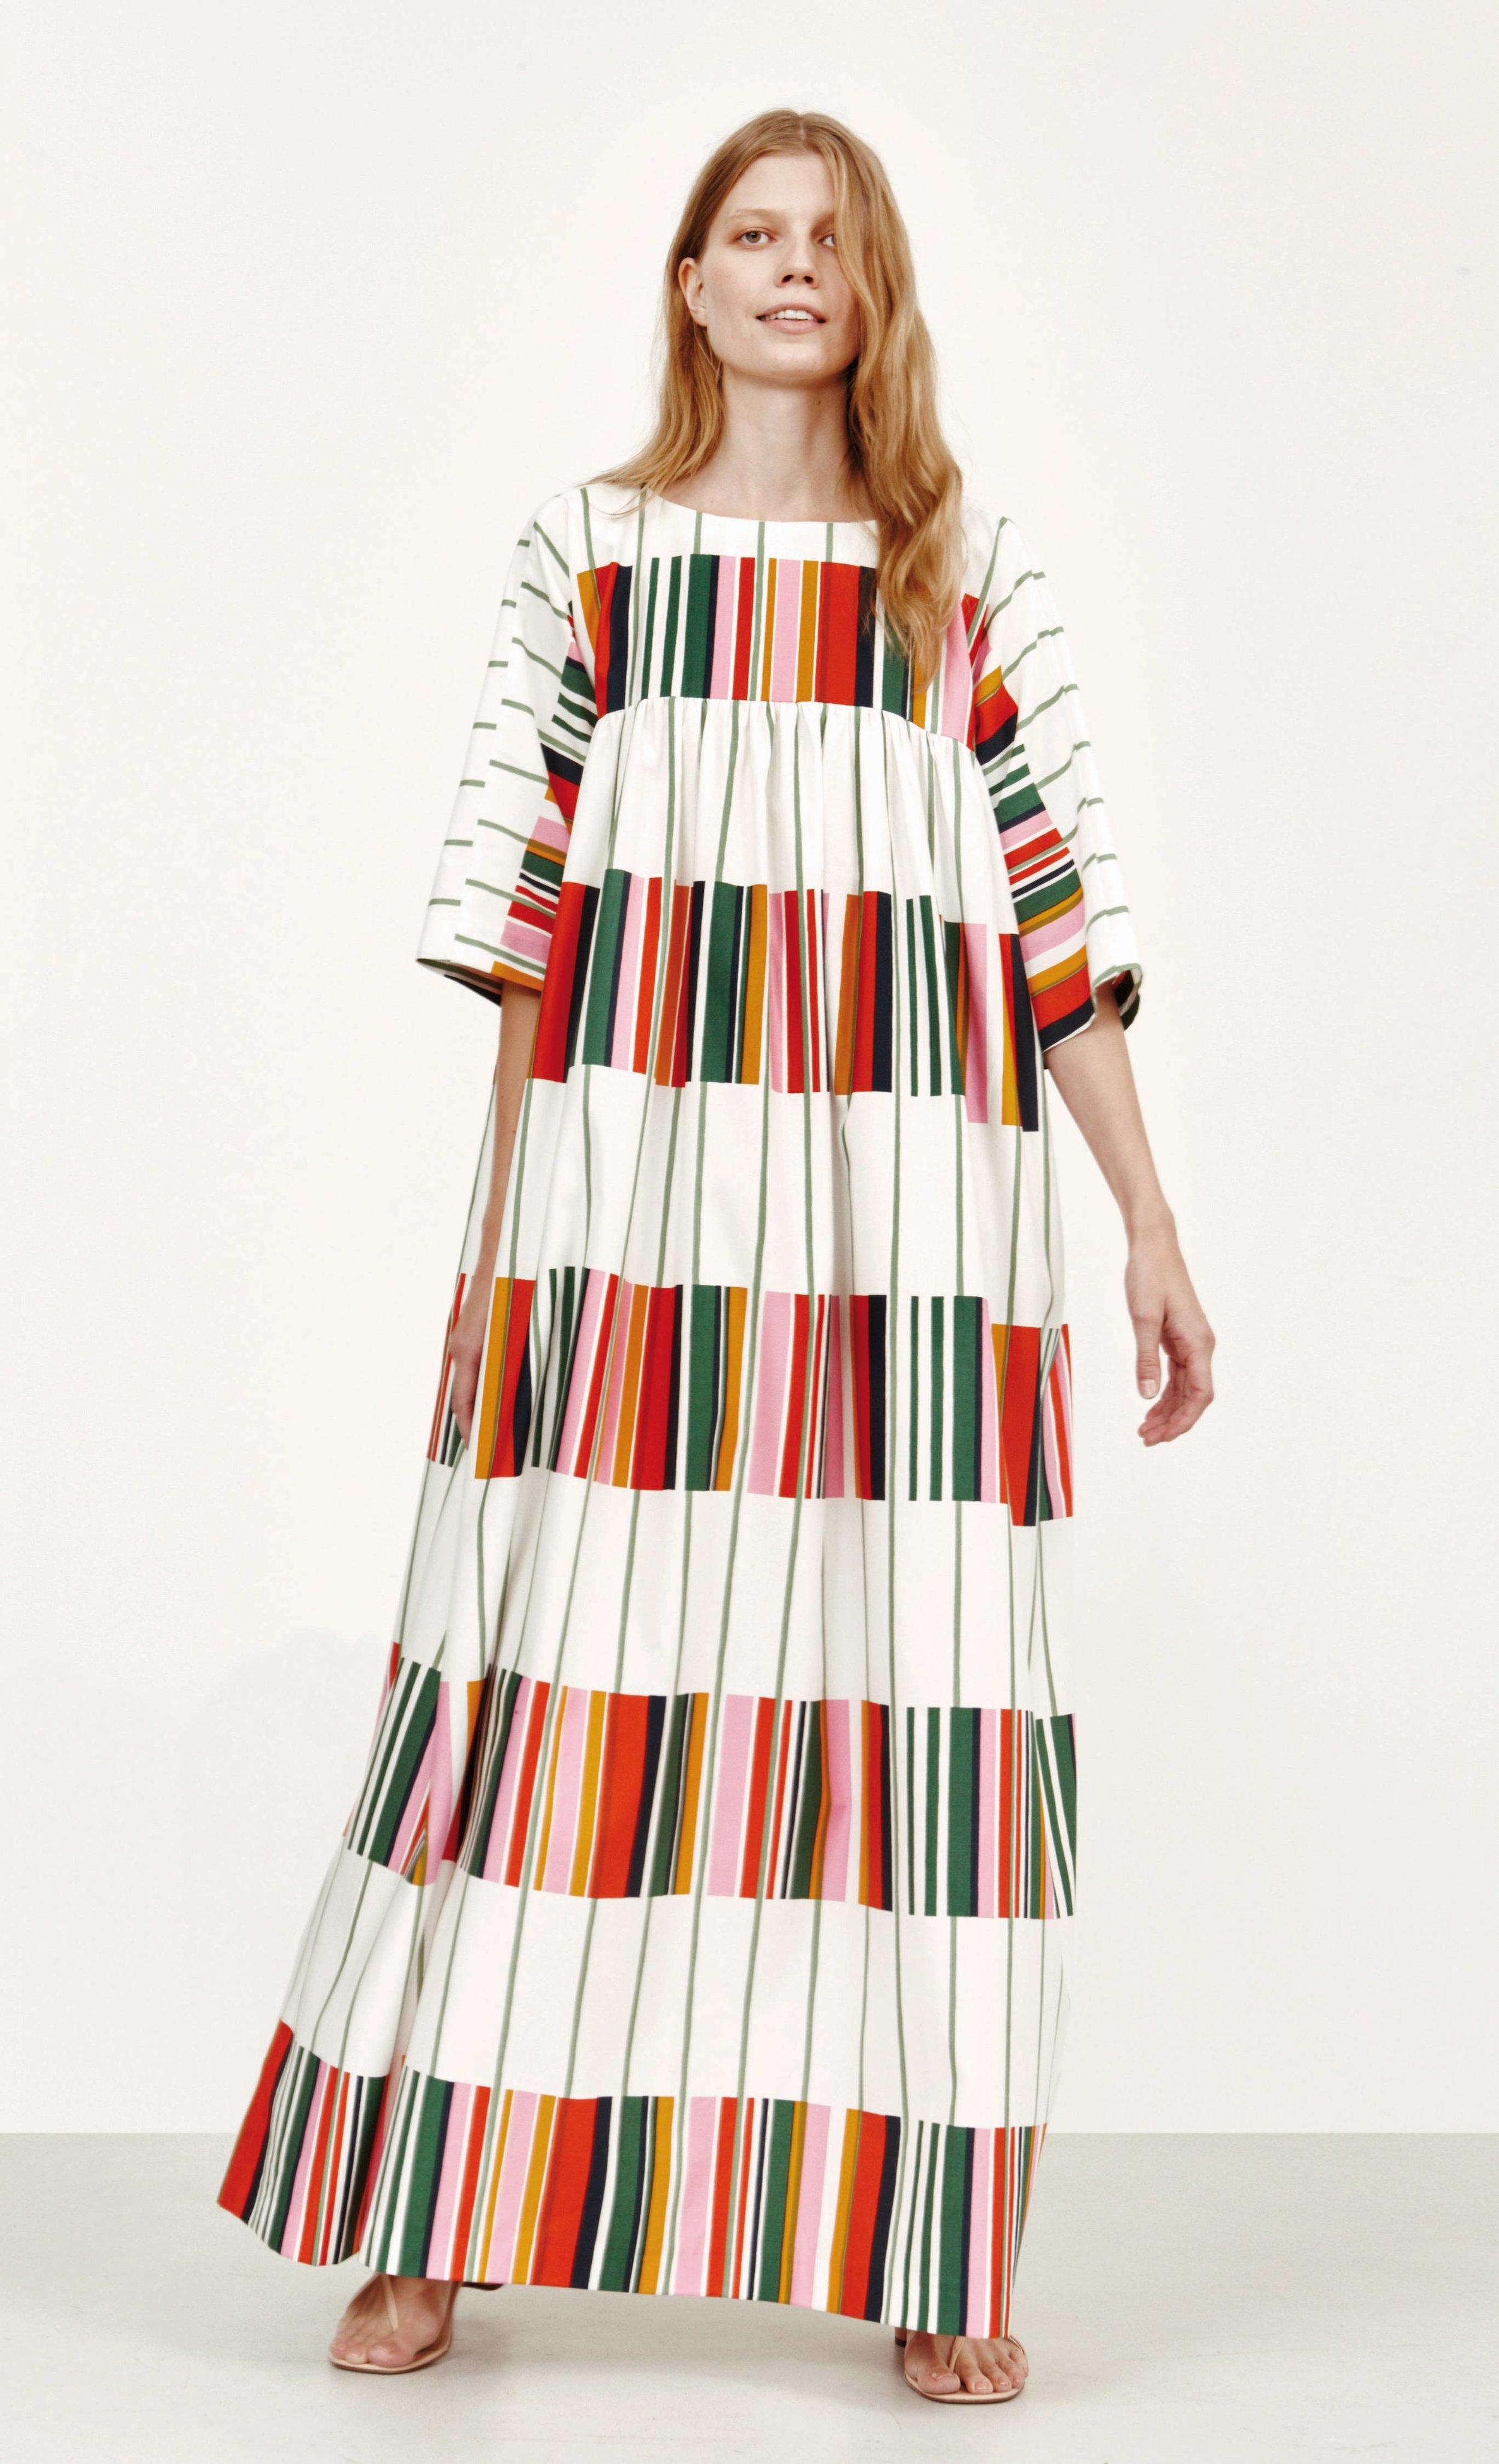 liidokki-dress-marimekko-172-1.jpg